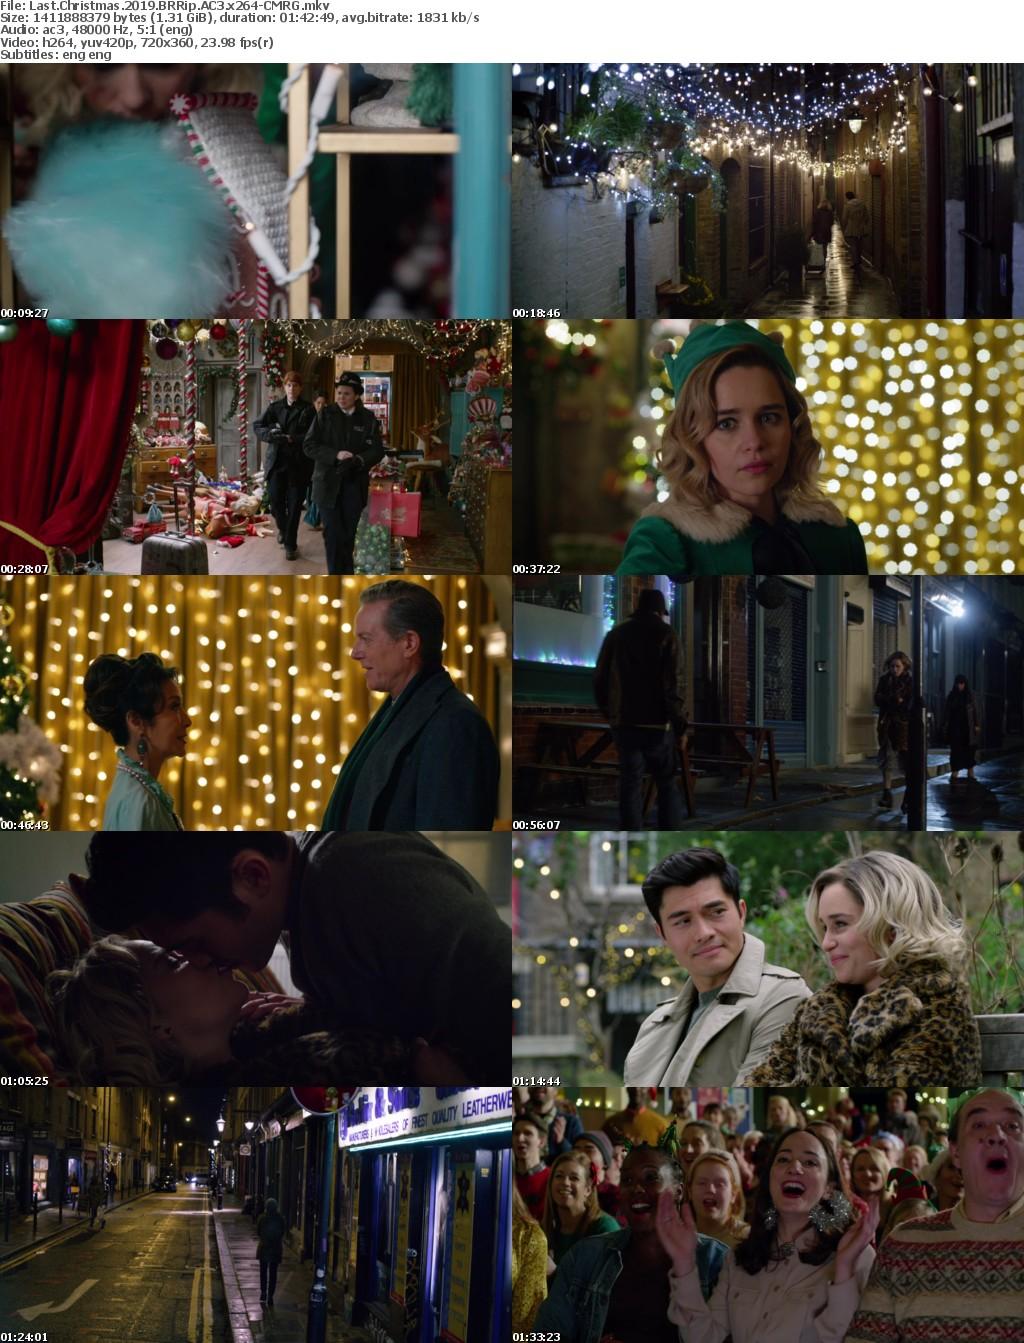 Last Christmas (2019) BRRip AC3 x264-CMRG